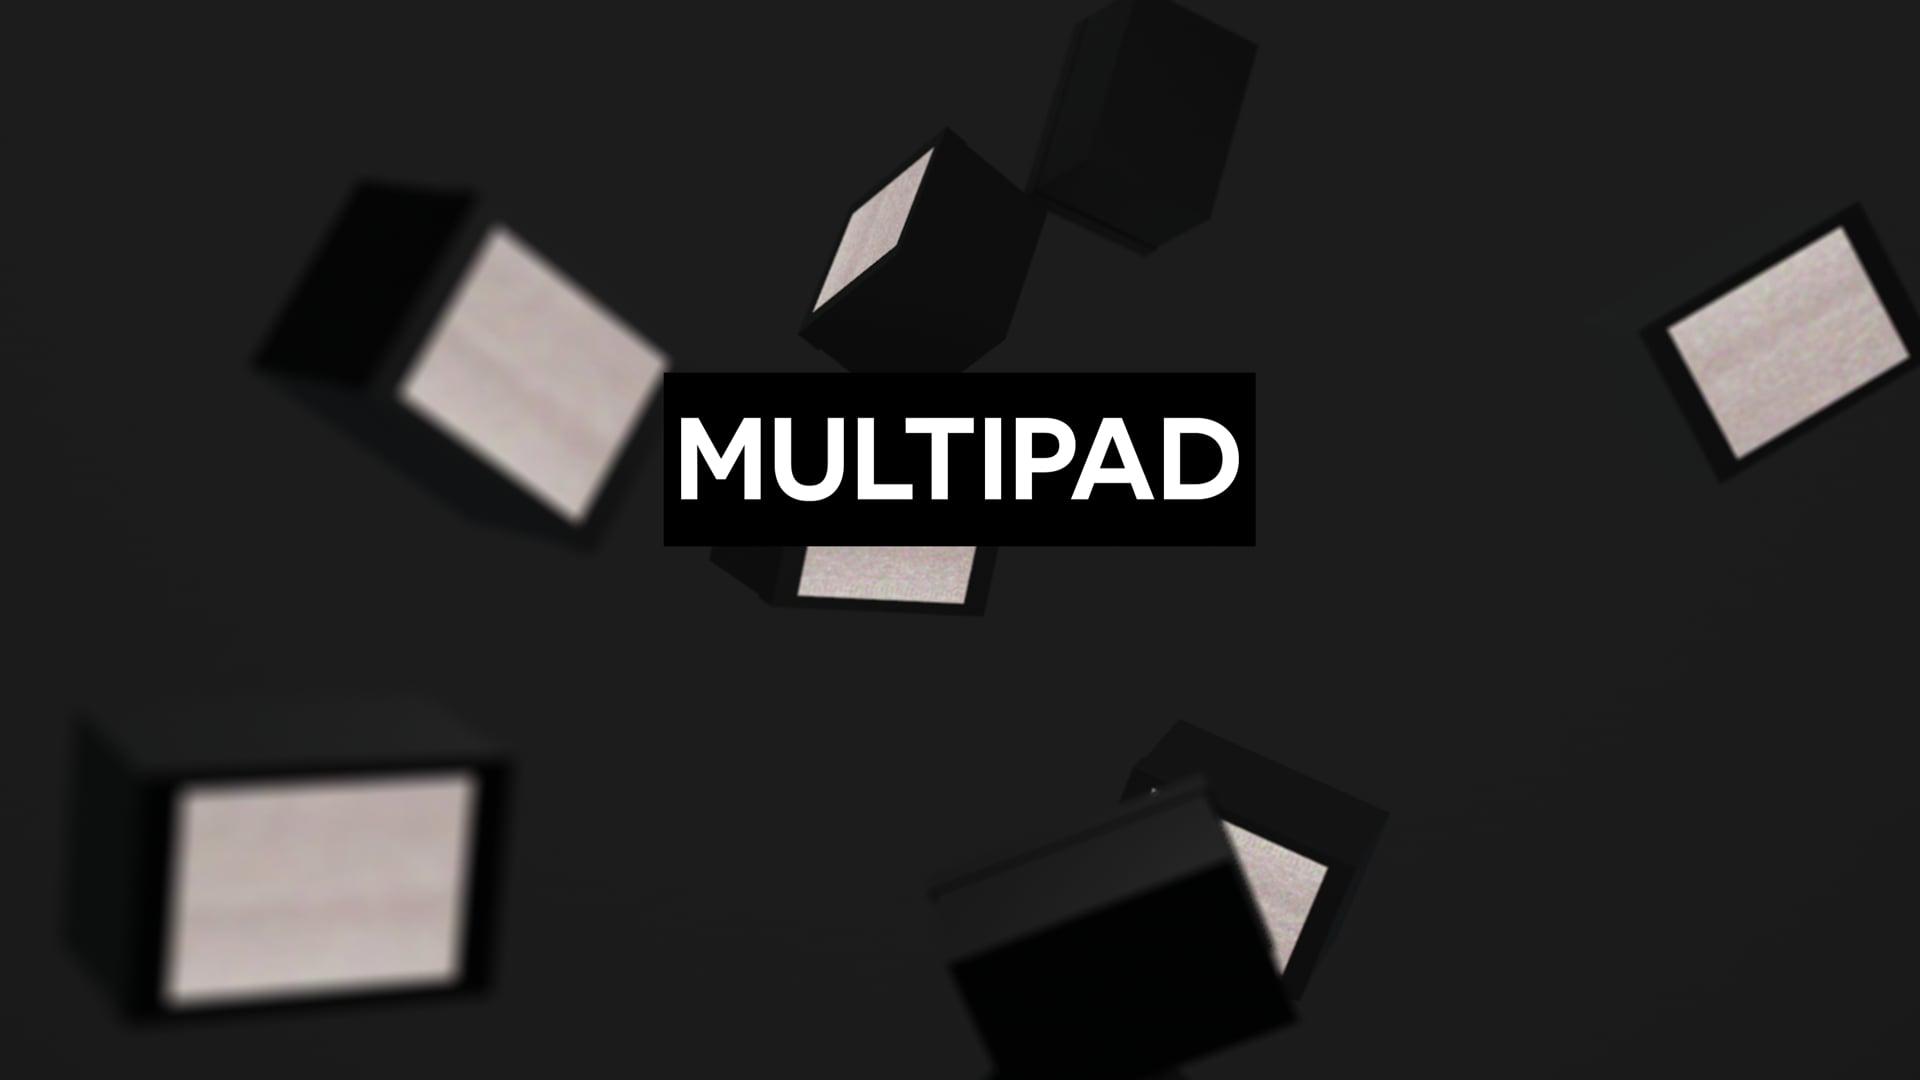 Multipad